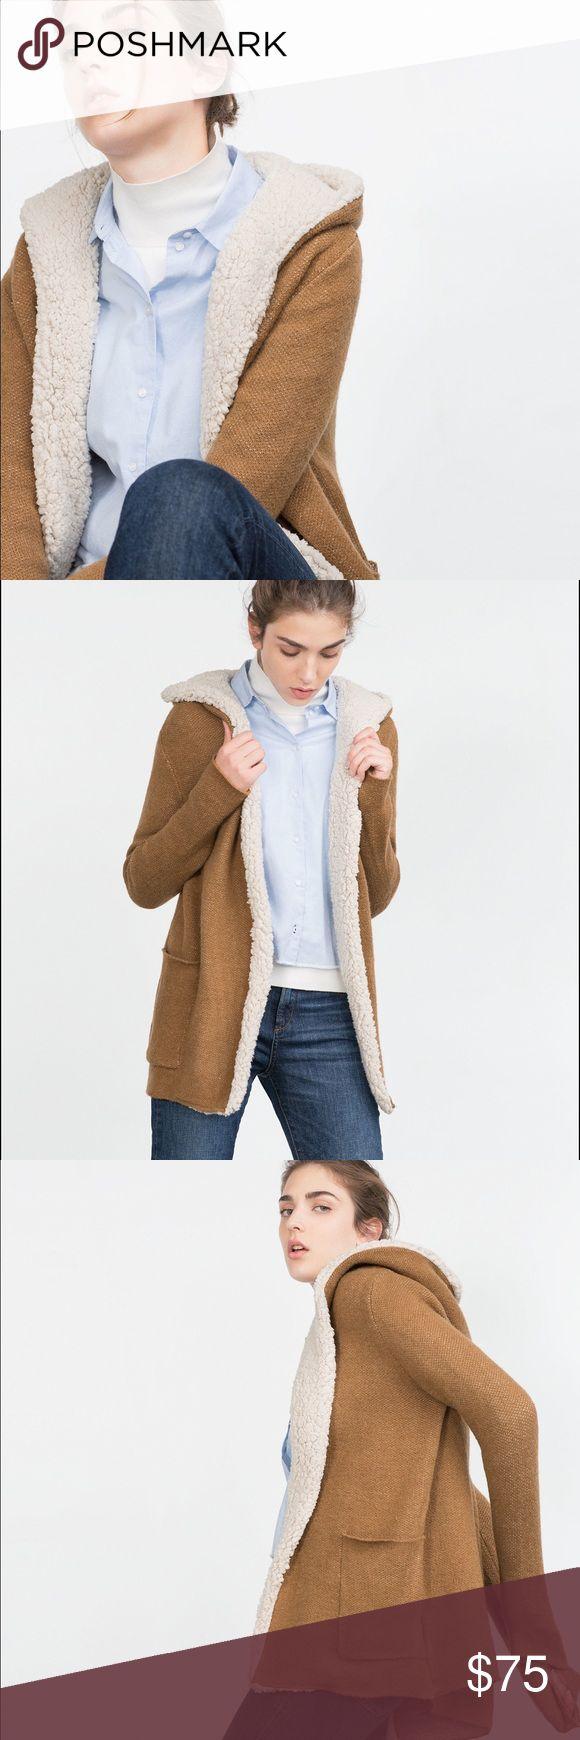 Zara Short Coat in Natural Worn a couple times. Zara Jackets & Coats